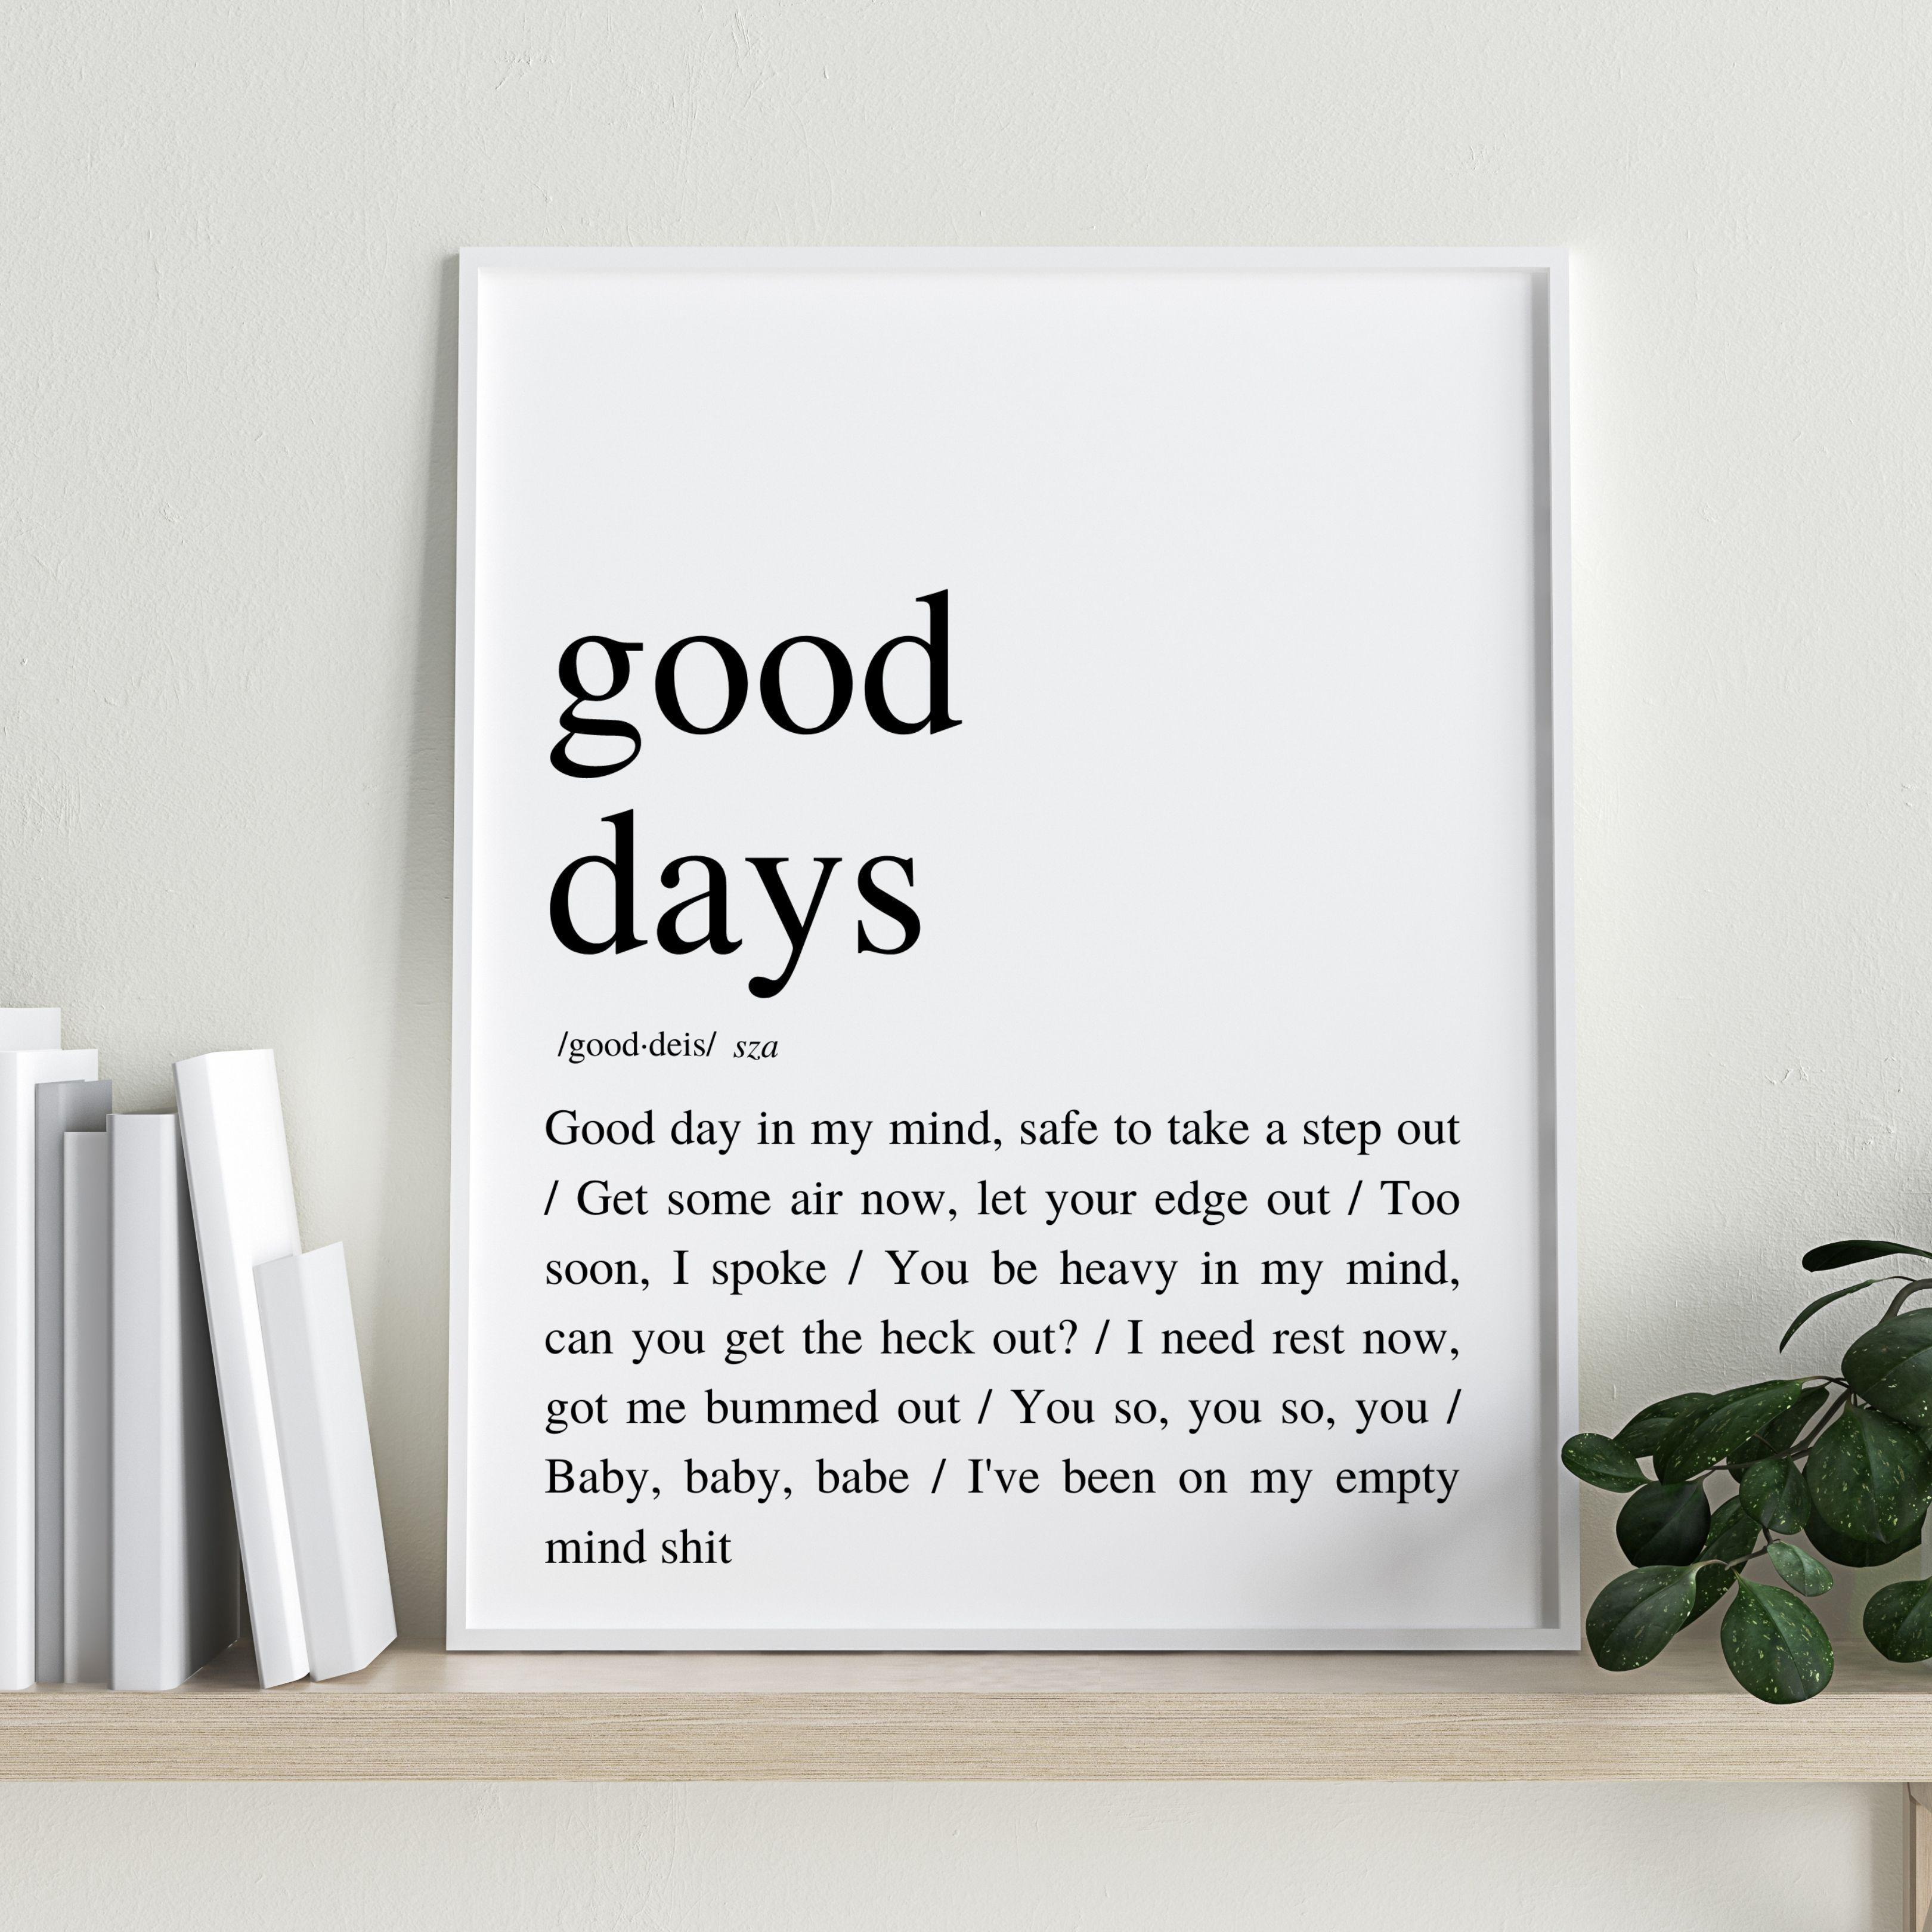 Sza Good Days Sza Lyrics Poster Sza Poster Sza Quotes Wall Art Wall Decor Lyrics Poster Wall Prints Digital Downloads Sza Lyrics Lyric Poster Imagination Quotes Pretty Quotes